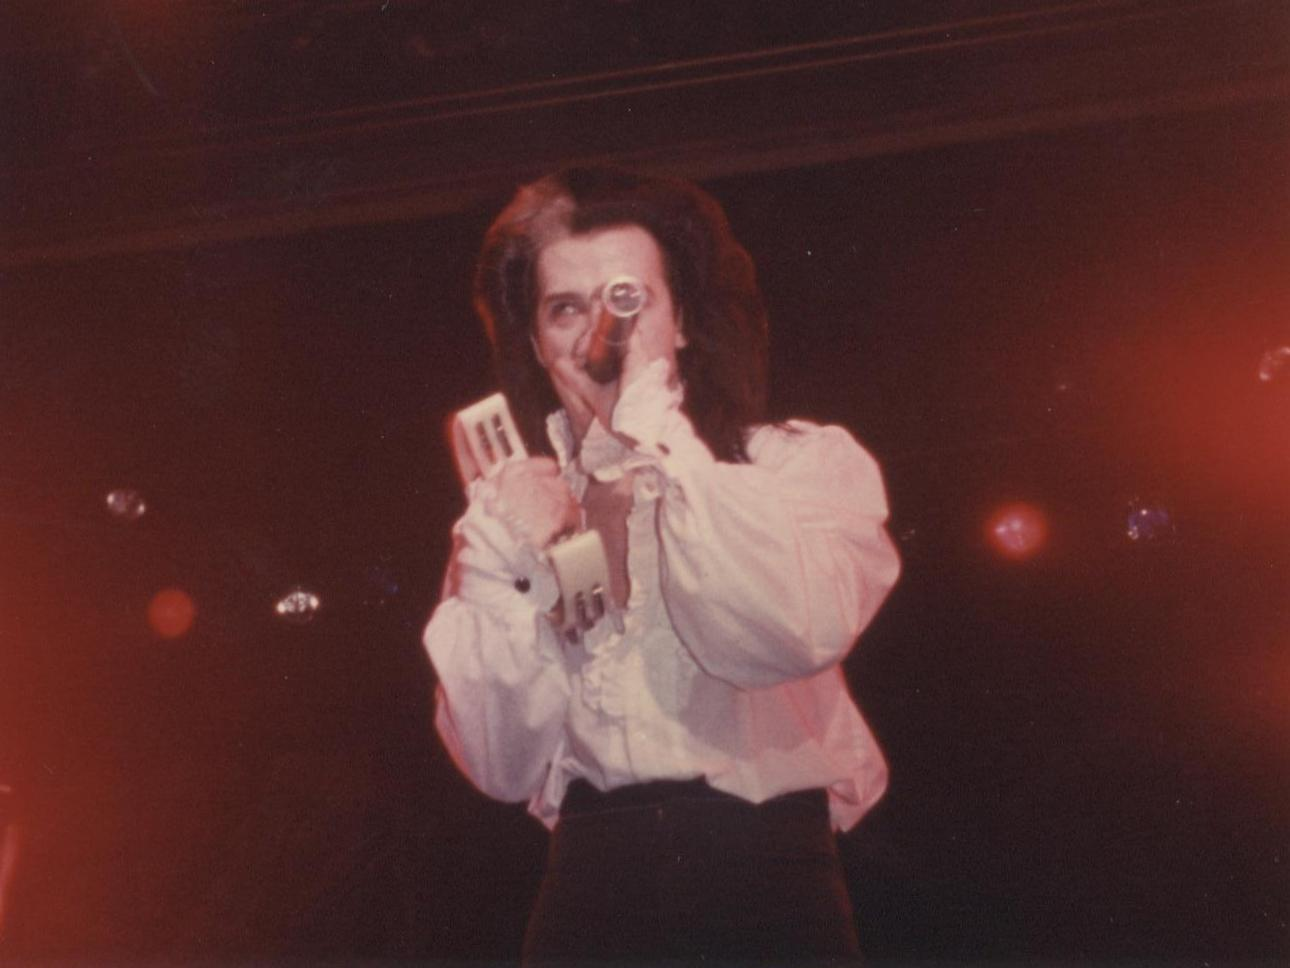 1985-11-07 l